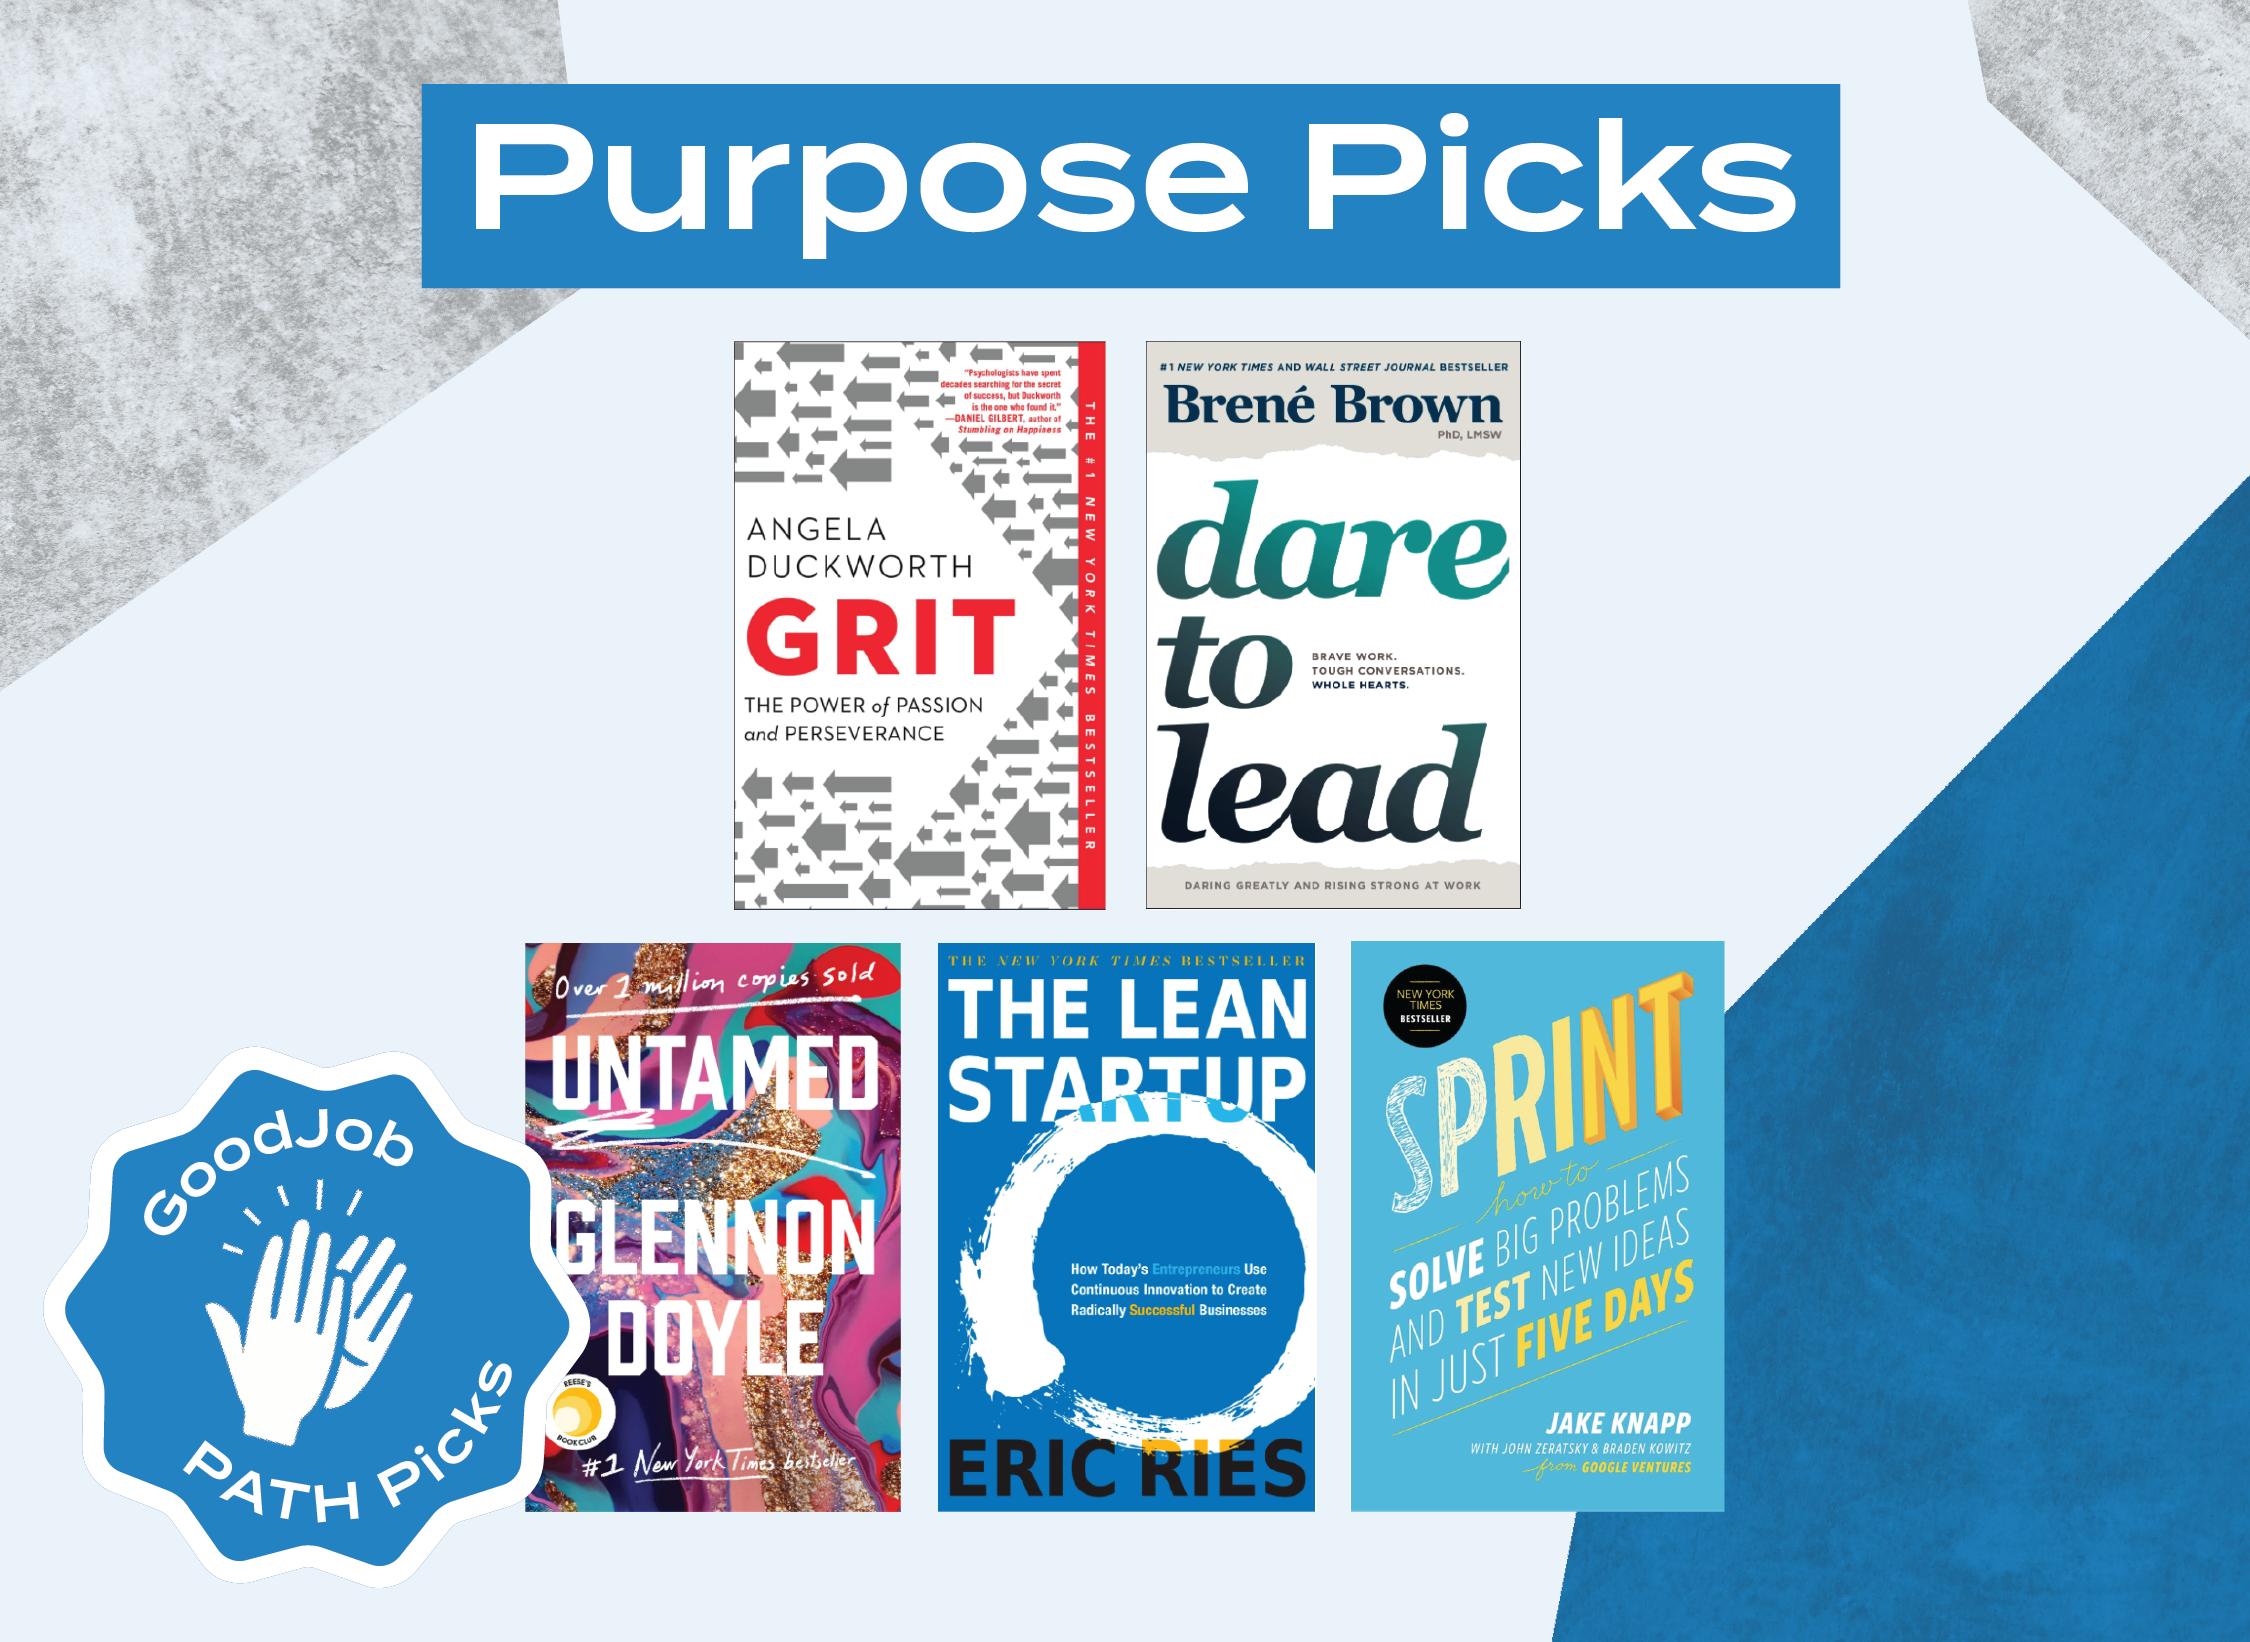 PATH Book List: Purpose